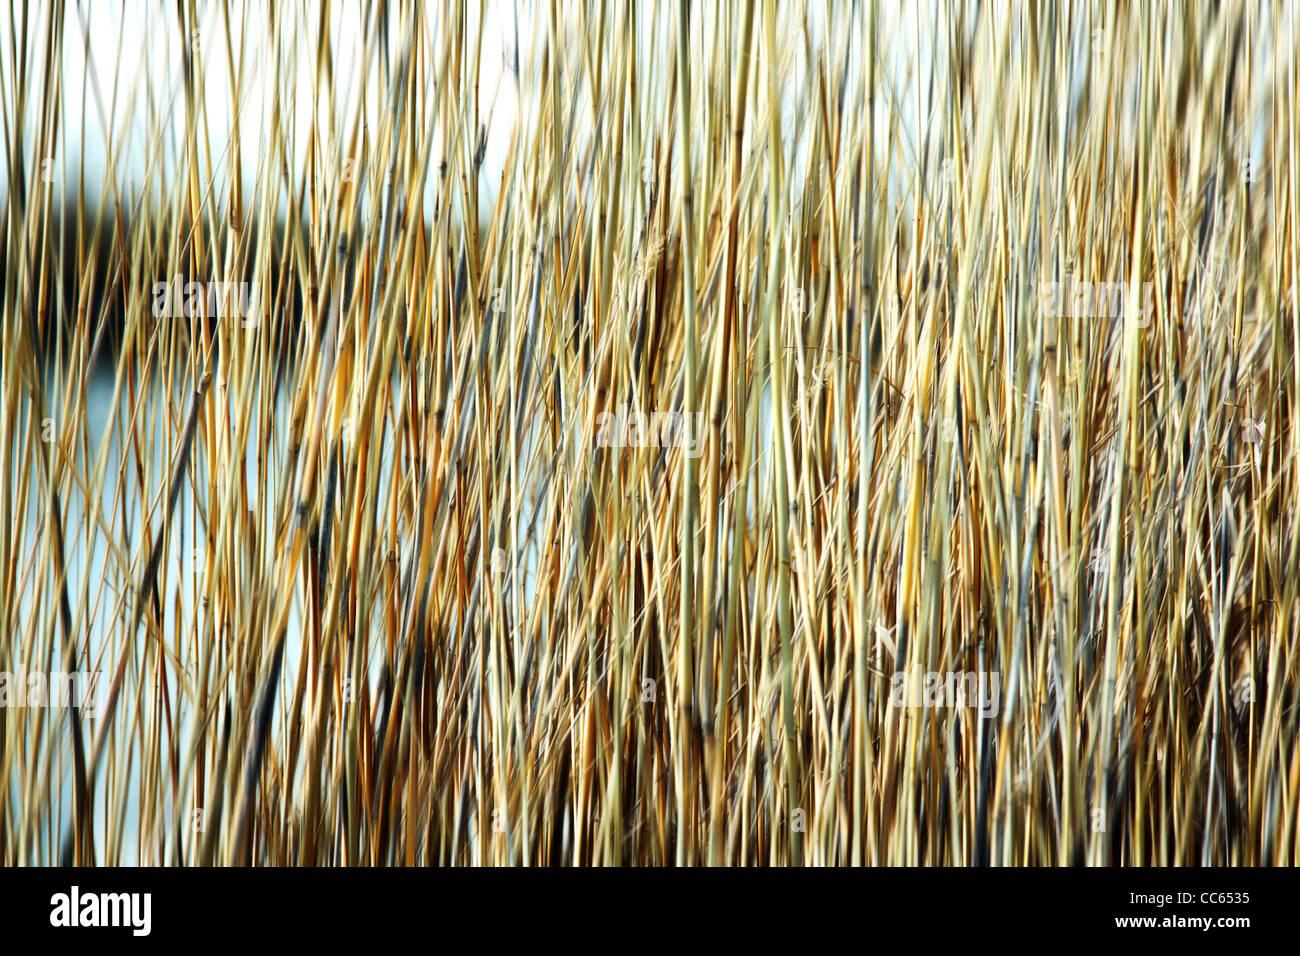 Bewegungsunschärfe Reed Hintergrund. Stockbild